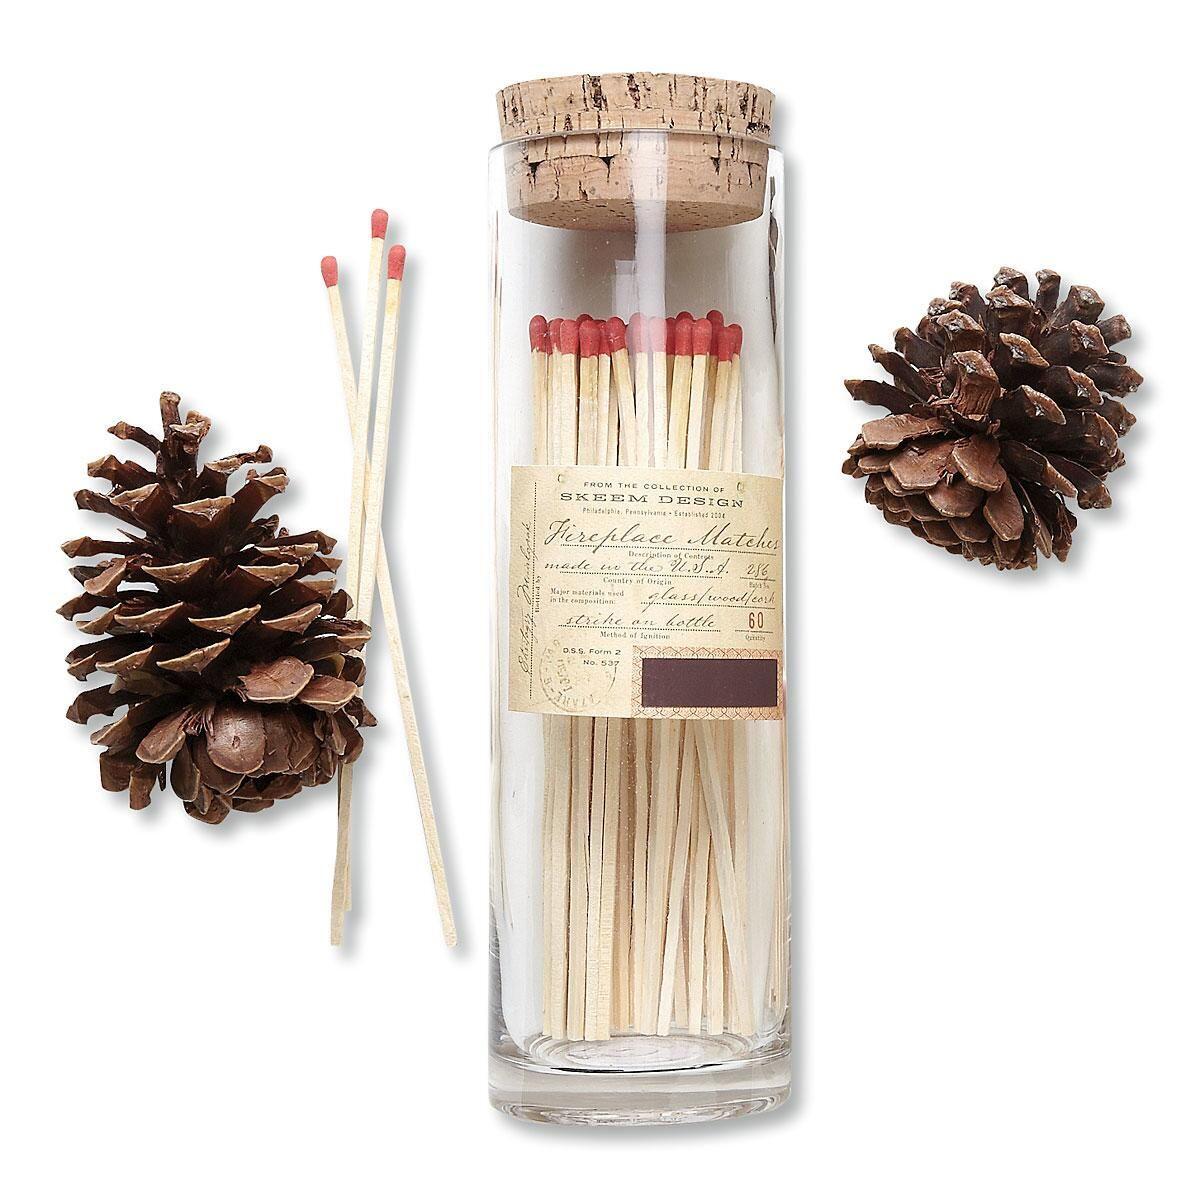 Fireplace Match Bottle By Skeem Lillian Vernon